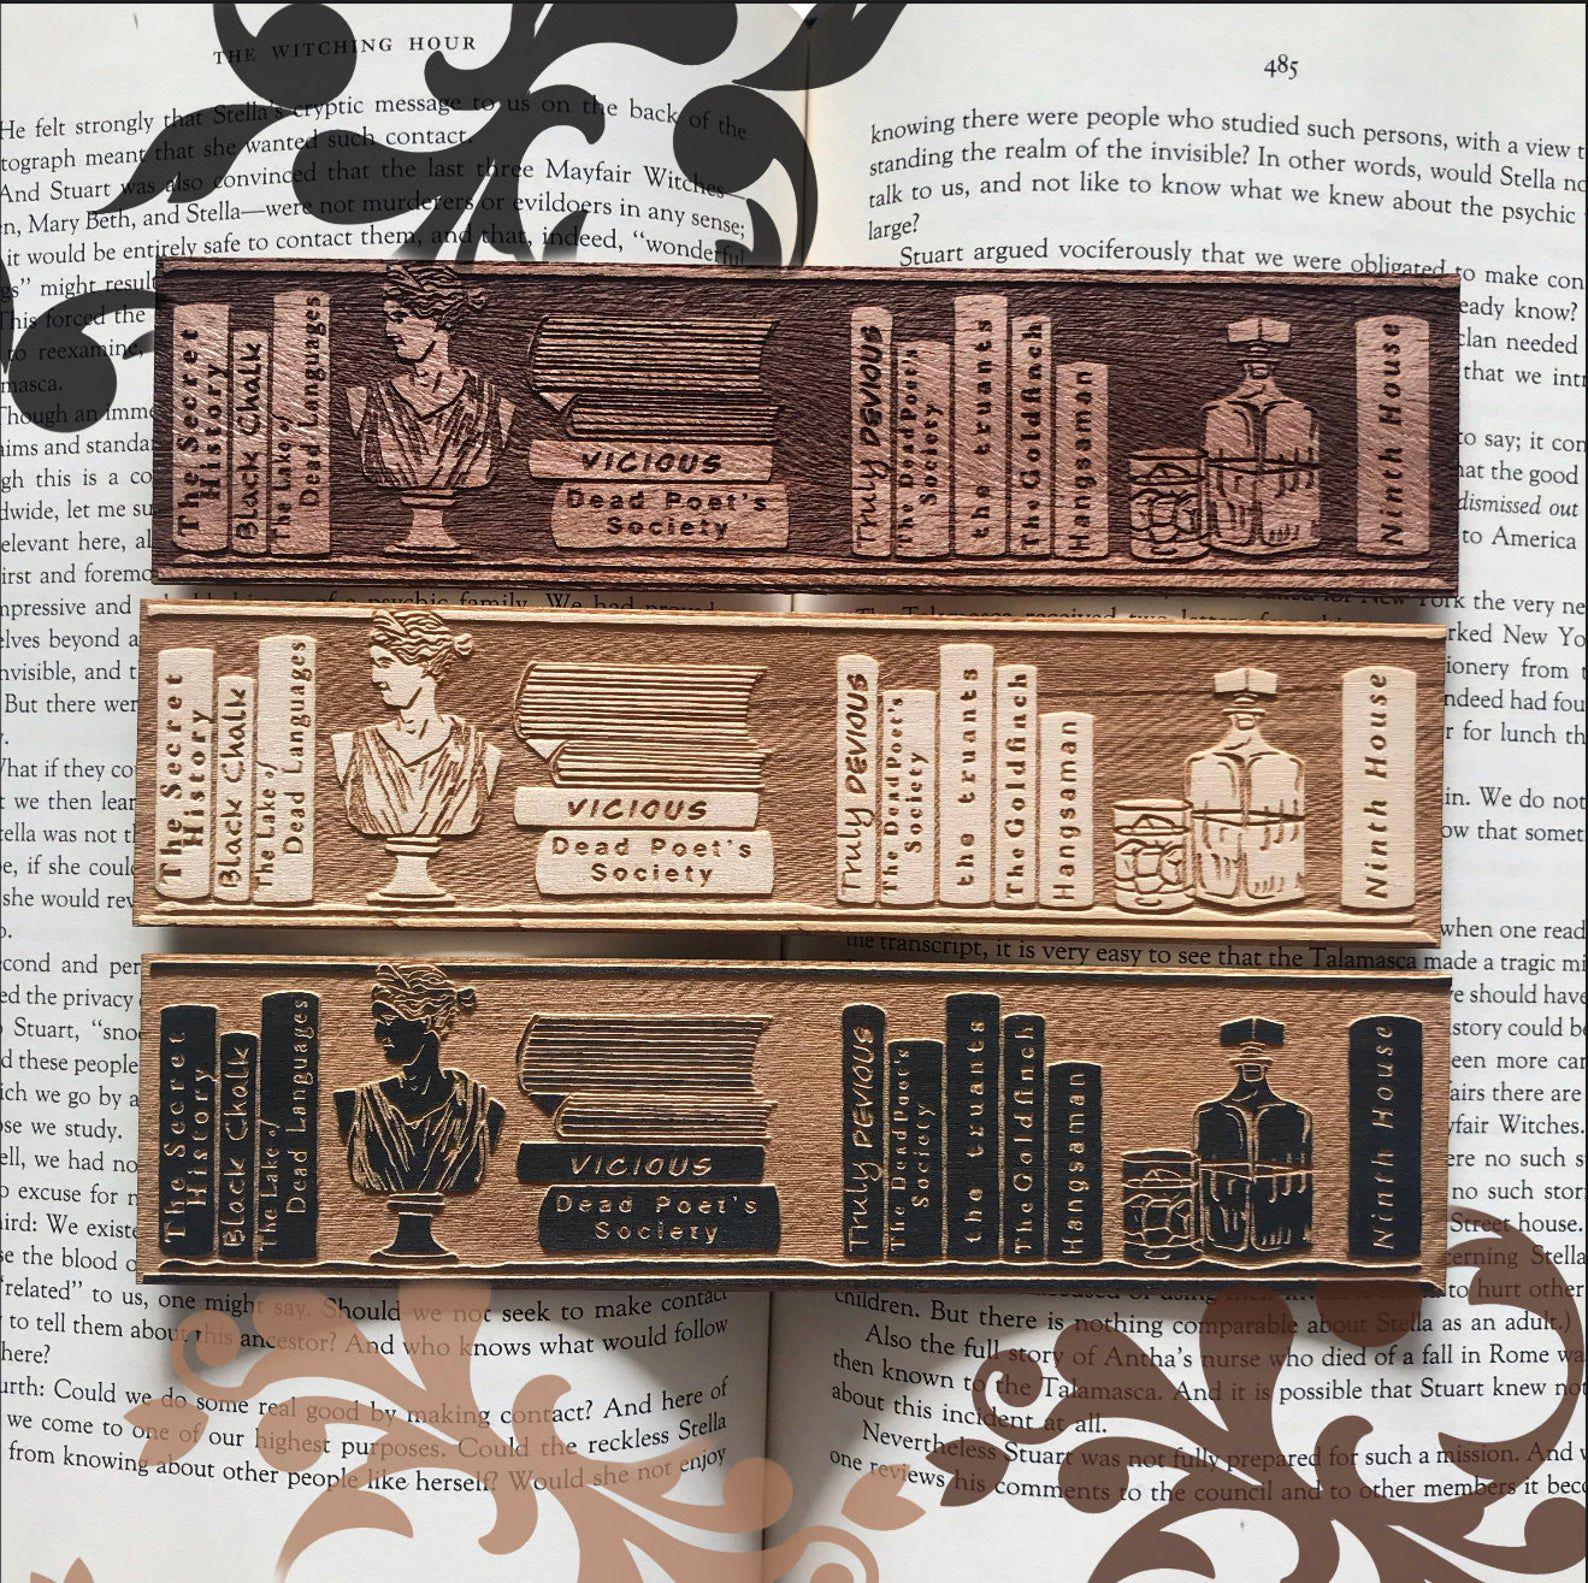 Image of wooden bookmark with bookshelves full of dark academia books.